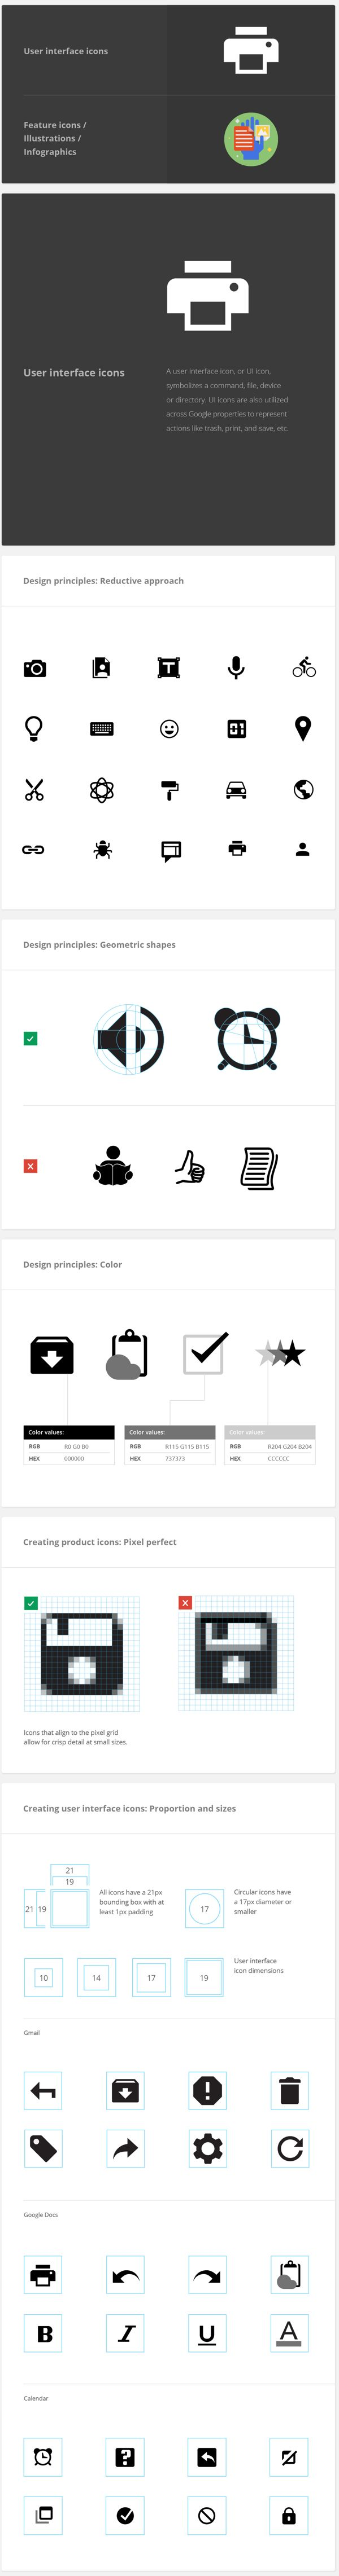 Google Visual Assets Guidelines - Part 2 by Roger Oddone, via Behance